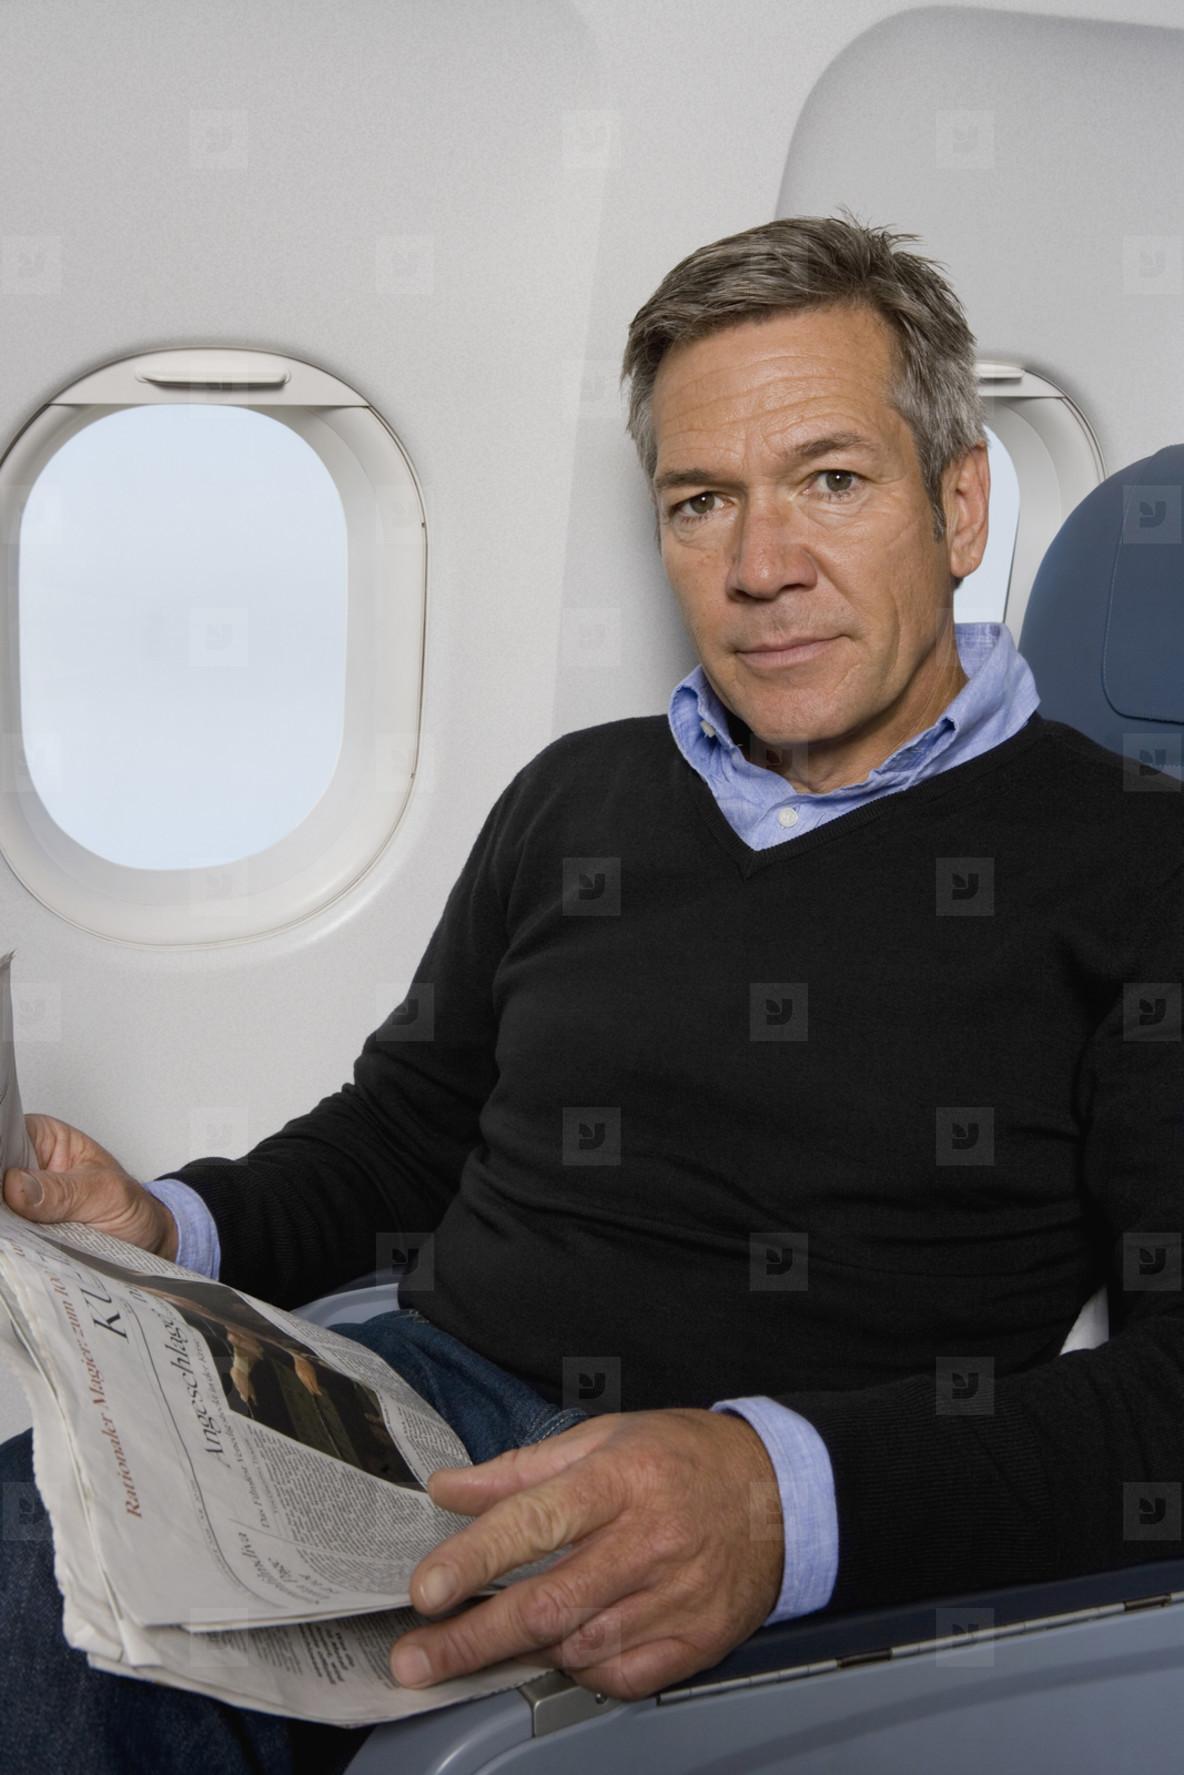 Airplane Travel  56